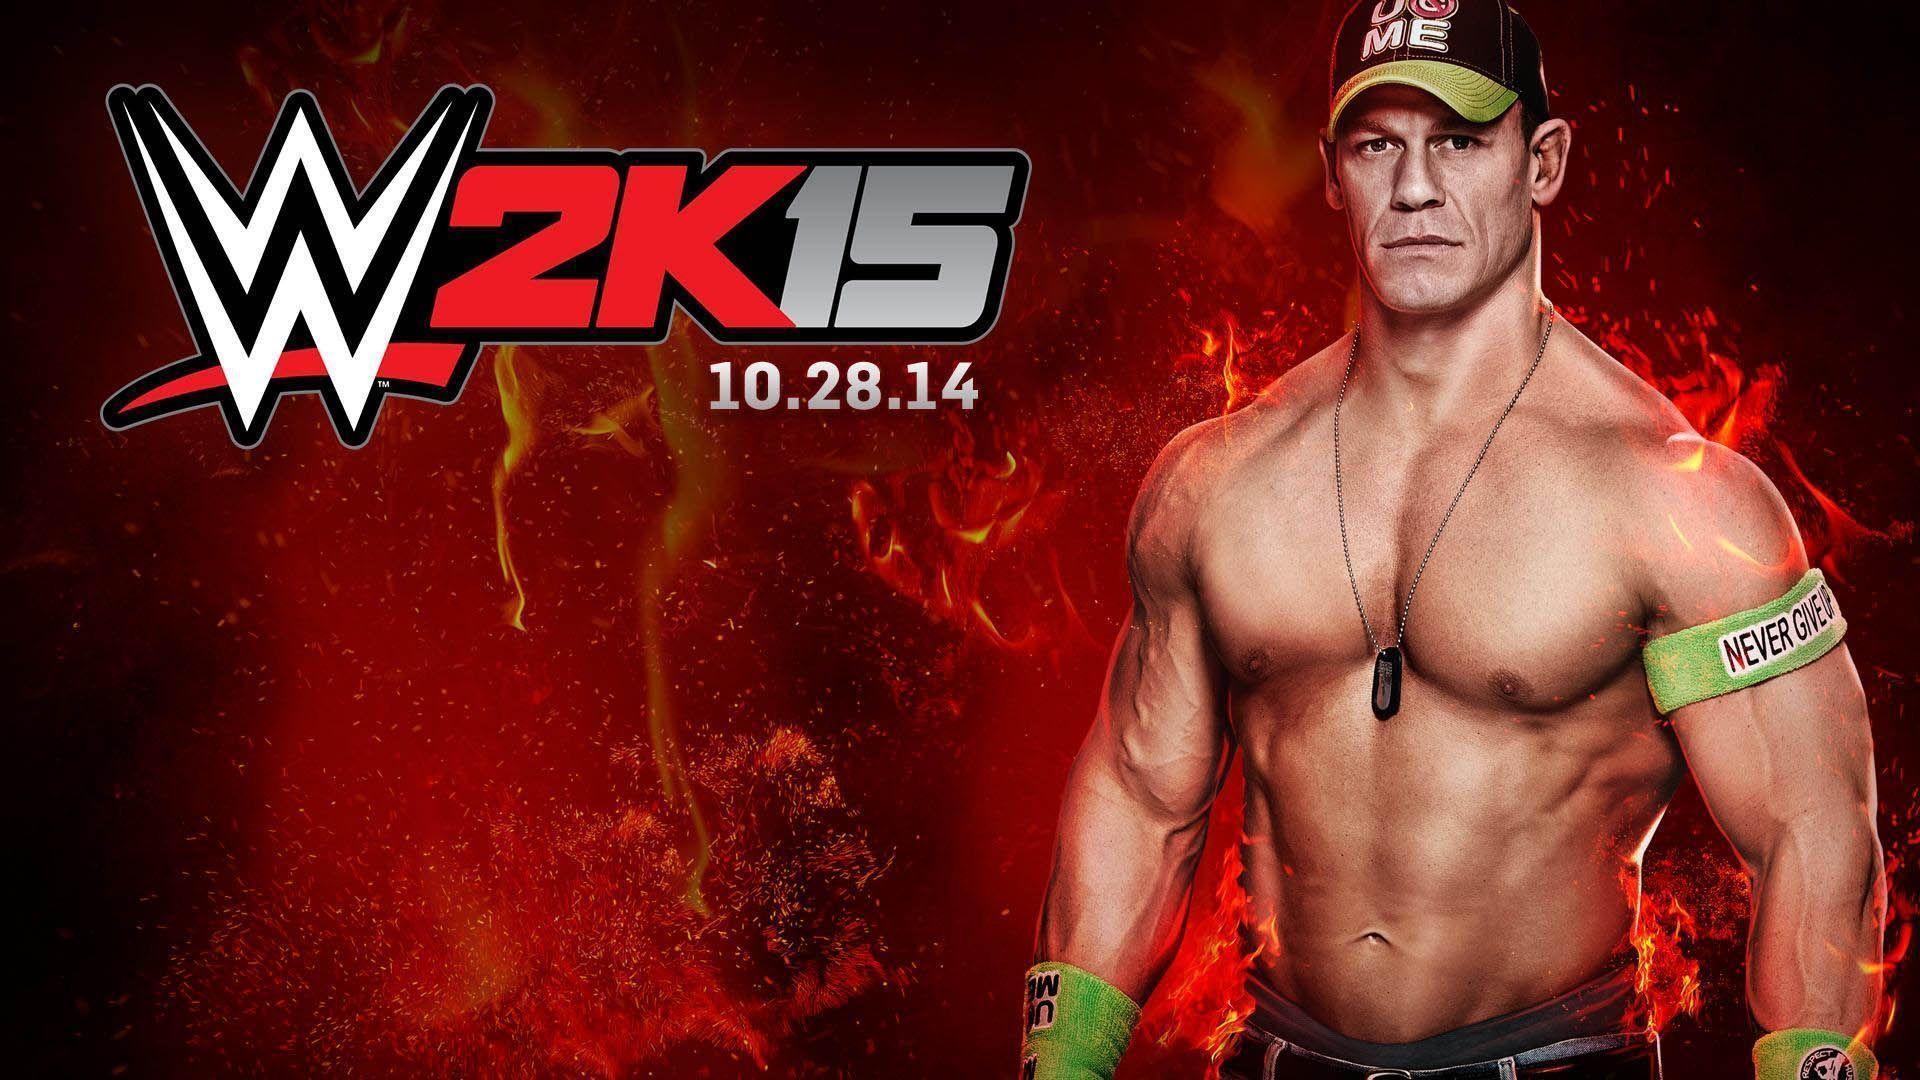 1920x1080 30 WWE John Cena Wallpapers HD Free Download 2016